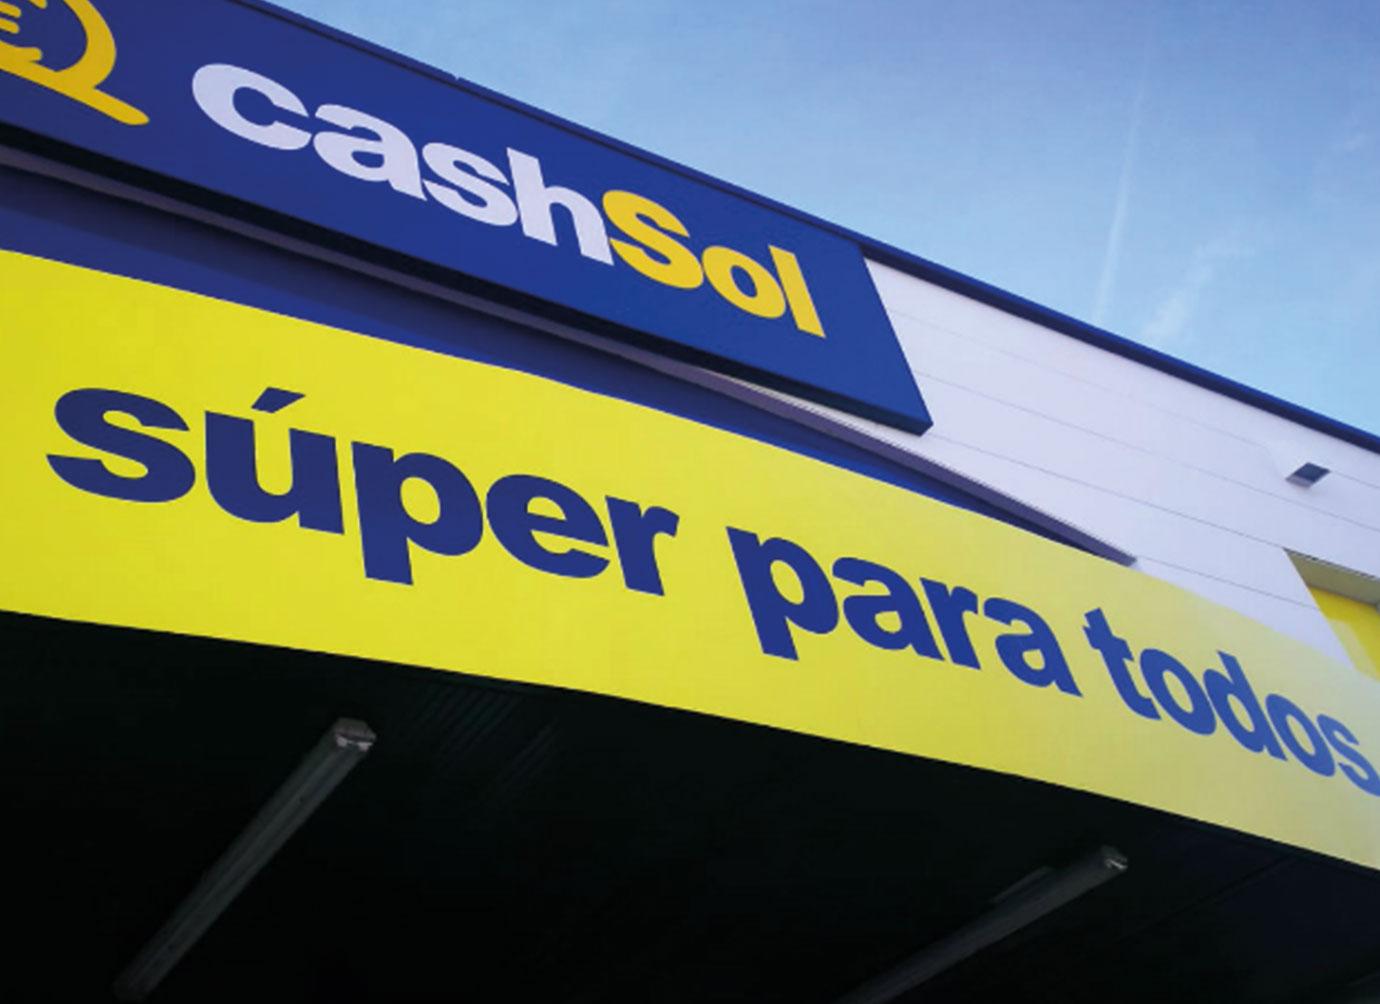 cashsol-nueva-imagen-de-supersol-mapesa